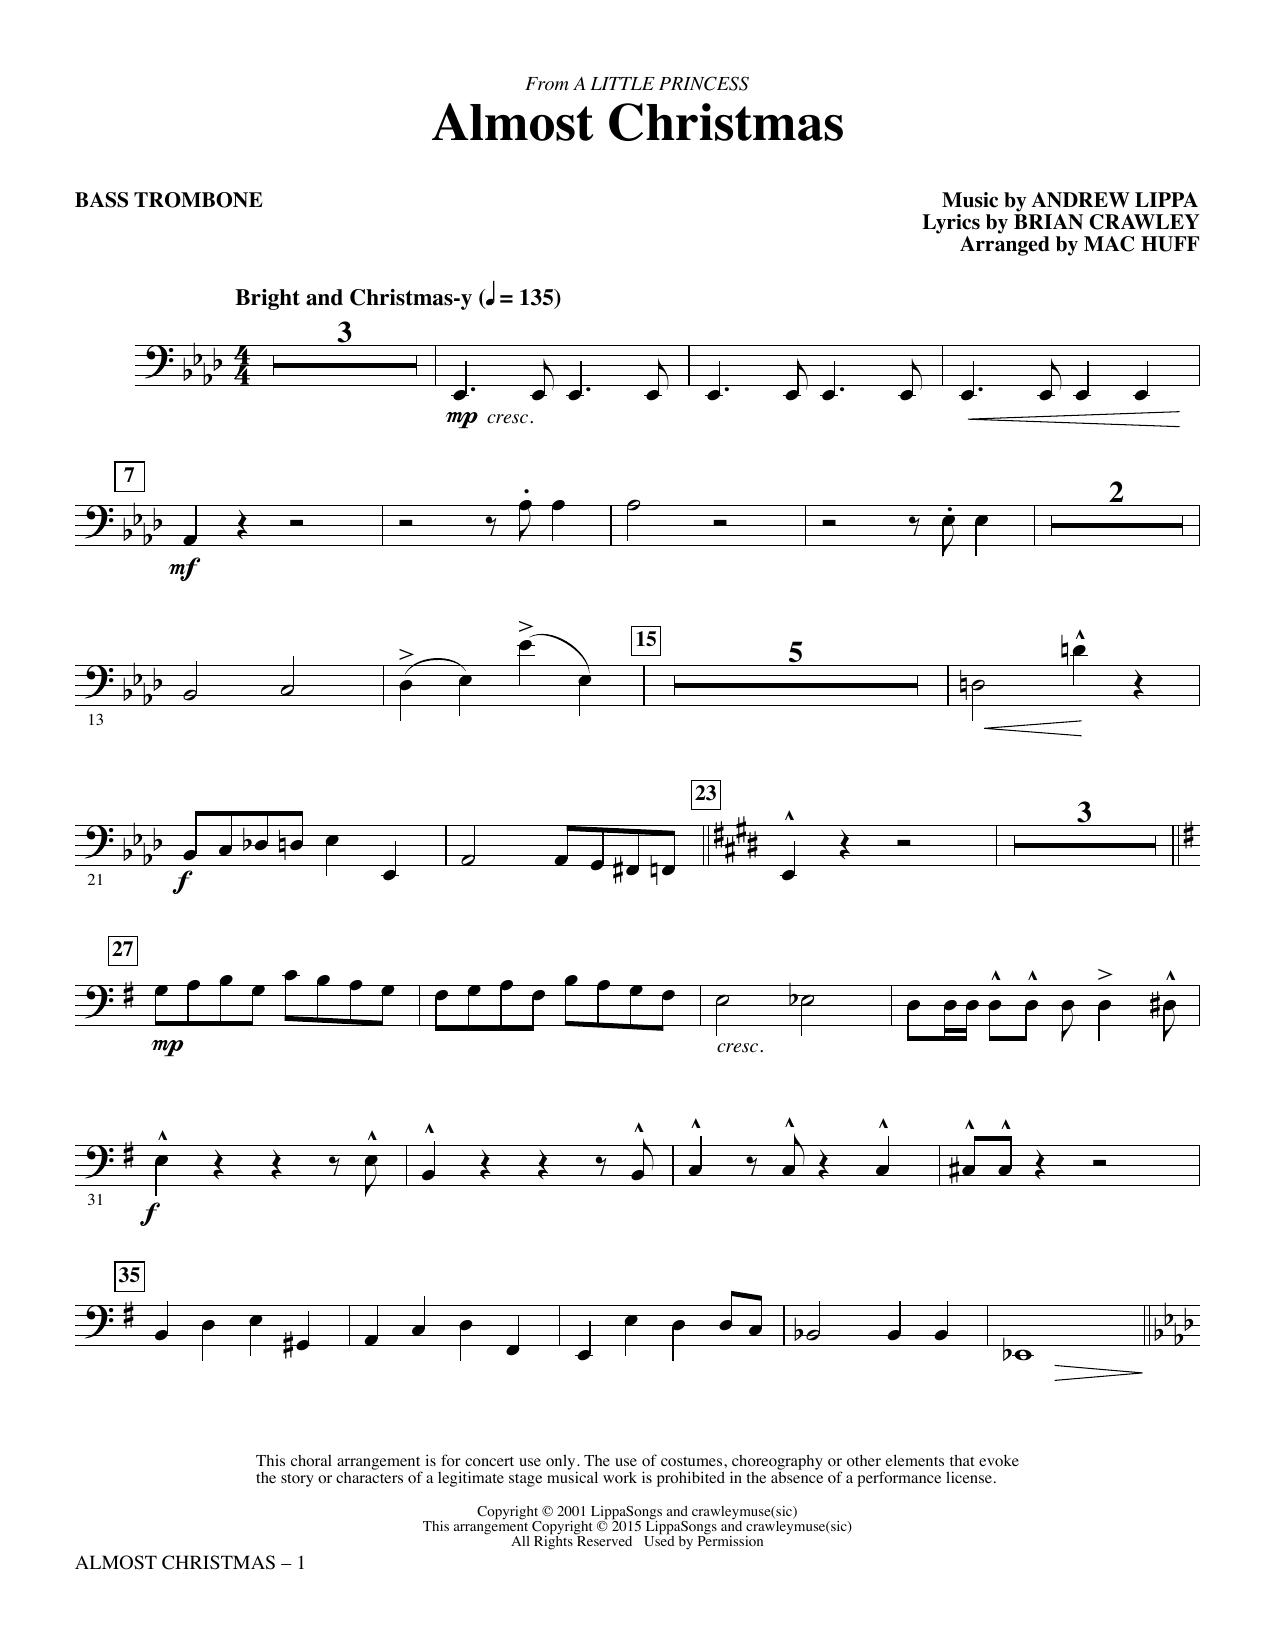 Almost Christmas - Bass Trombone sheet music